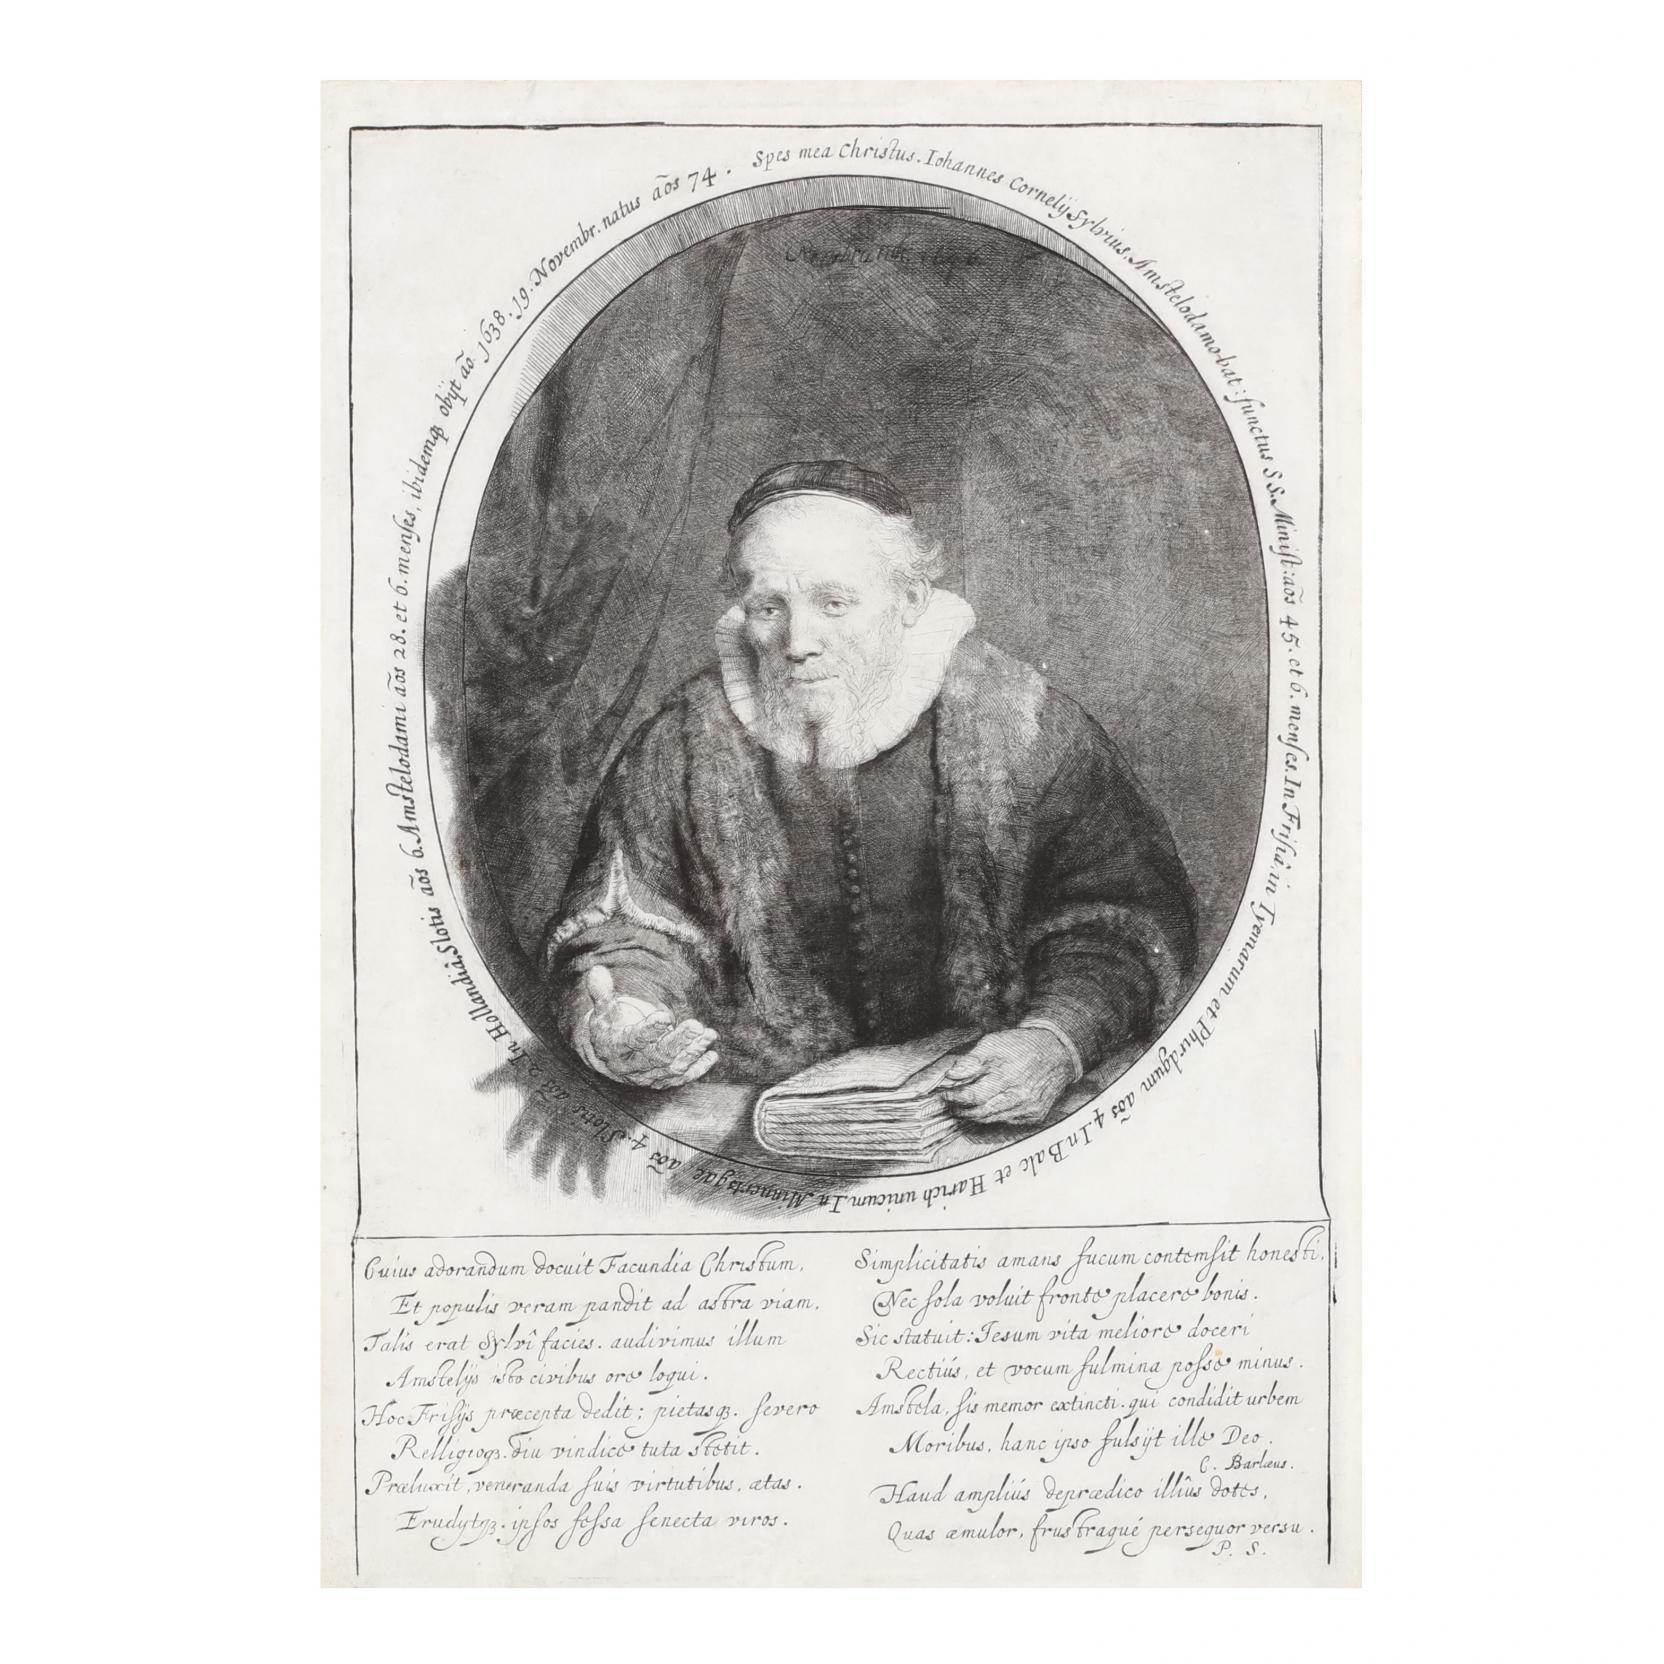 rembrandt-van-rijn-dutch-1606-1669-i-jan-cornelis-sylvius-preacher-i